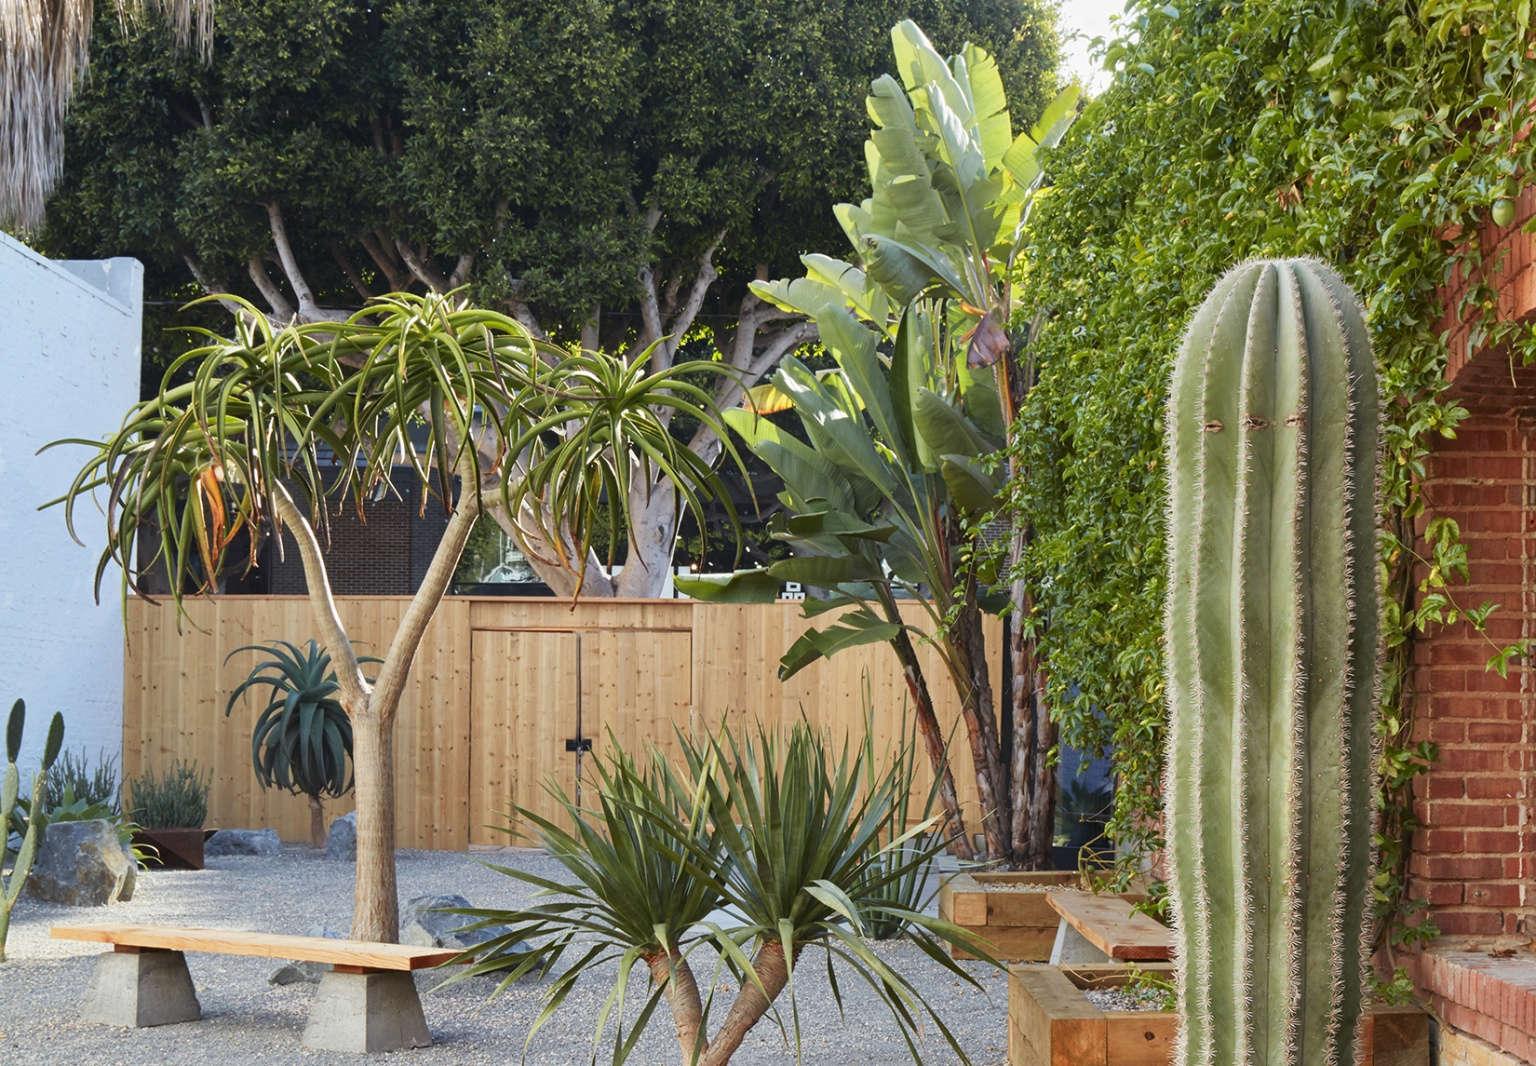 Landscape Architecture Design For A Desert Climate A Zen Garden In Santa Monica